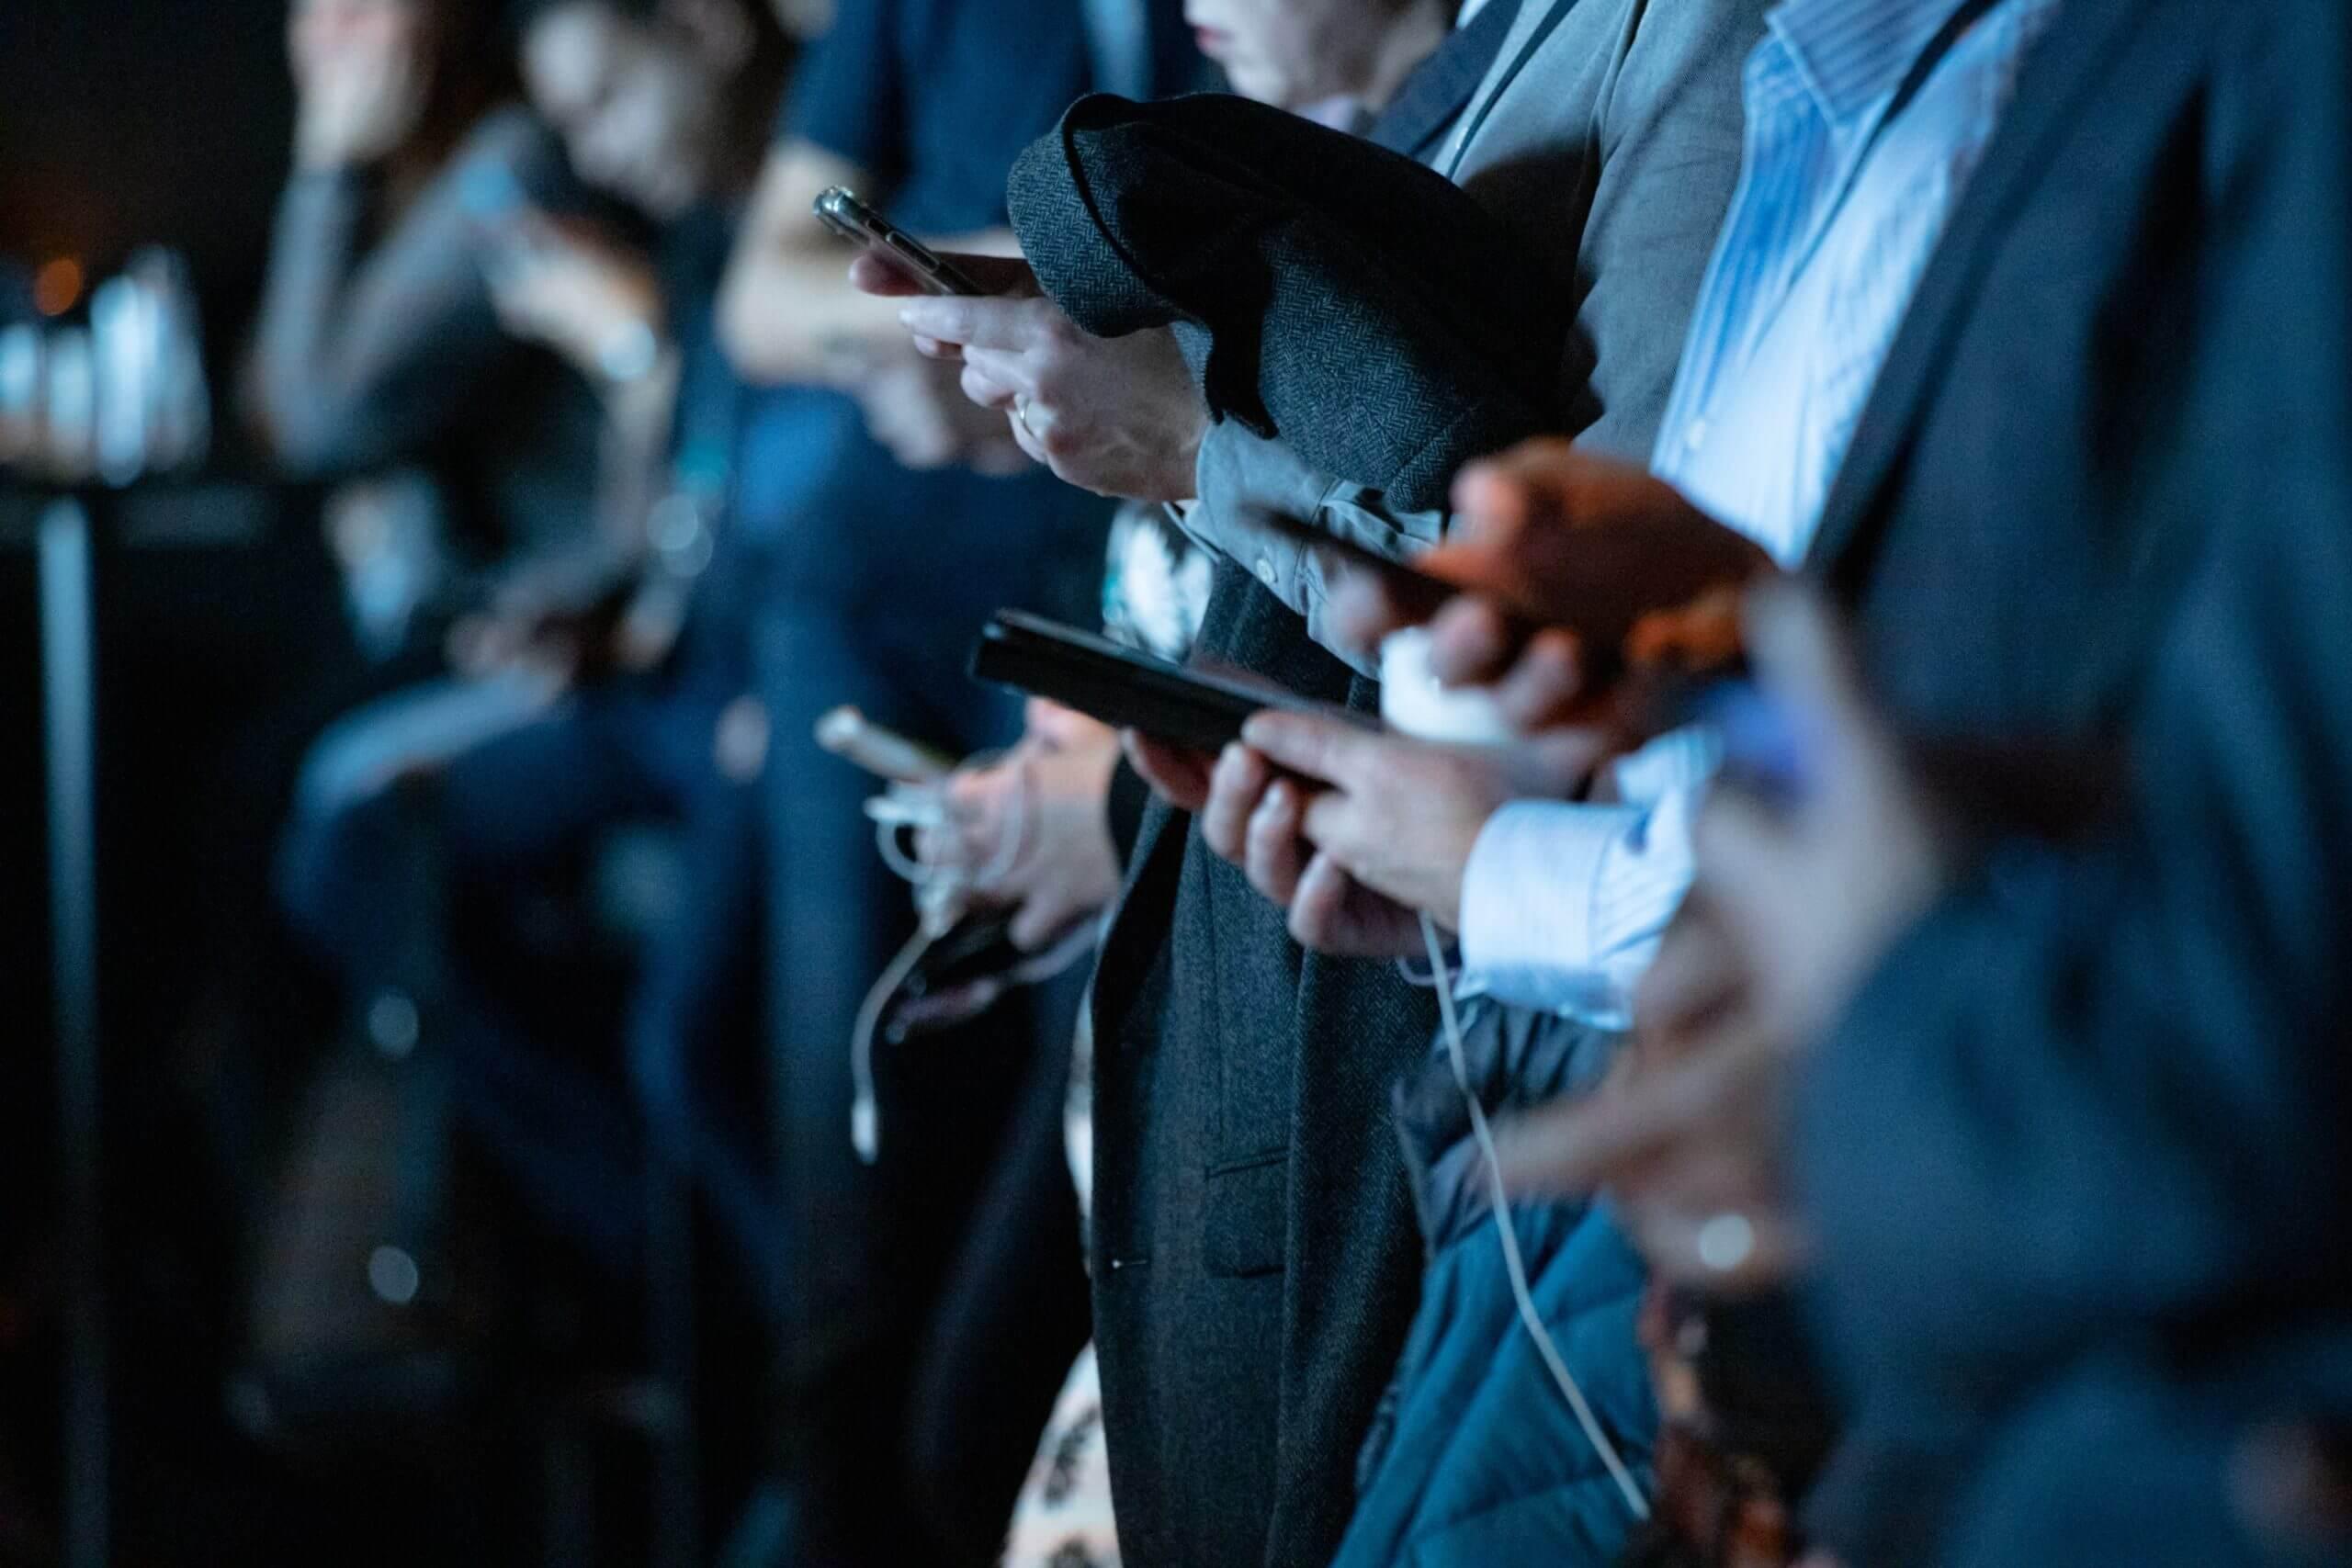 Group of men on their phones